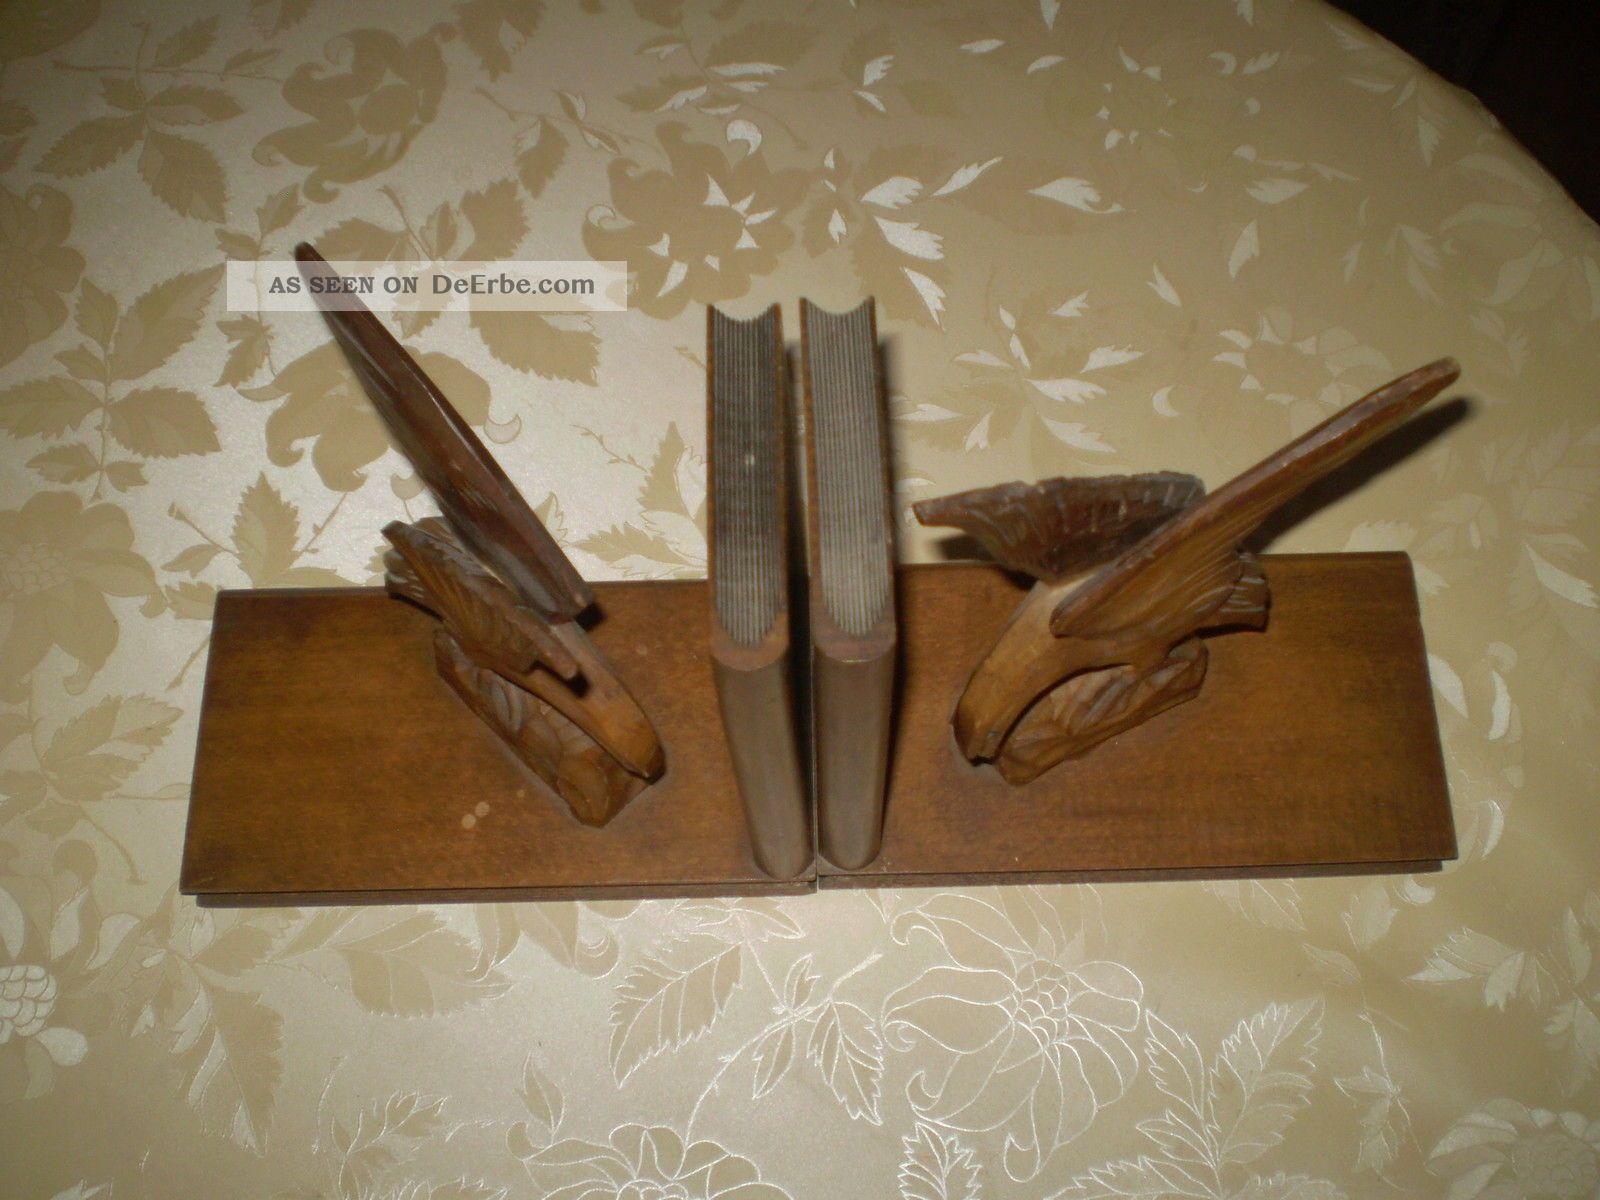 2 buchst tzen holz handarbeit geschnitzt adler alt. Black Bedroom Furniture Sets. Home Design Ideas